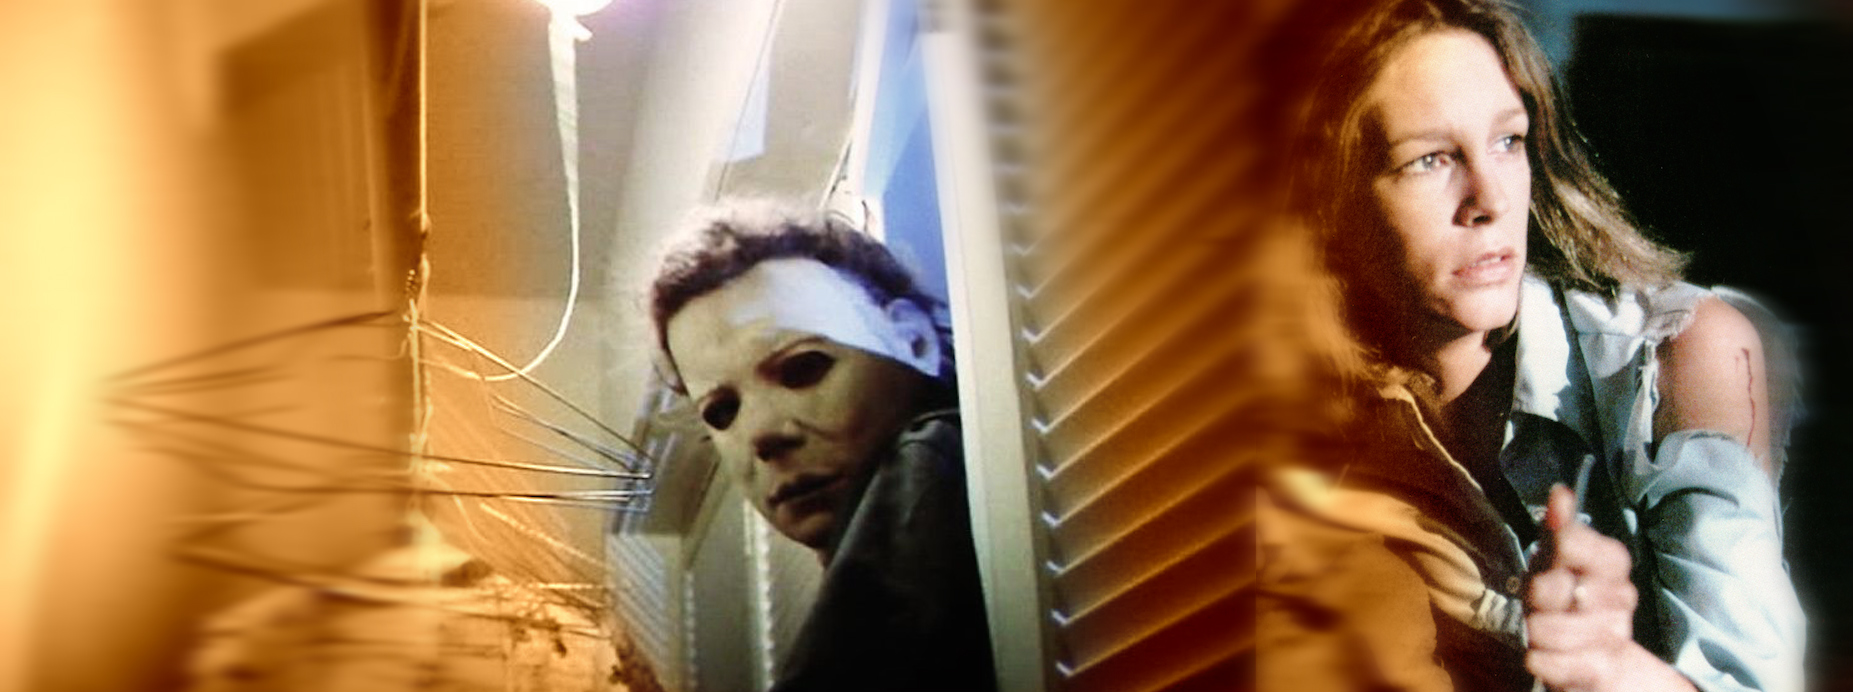 Robert Tharp Your Choice : Halloween